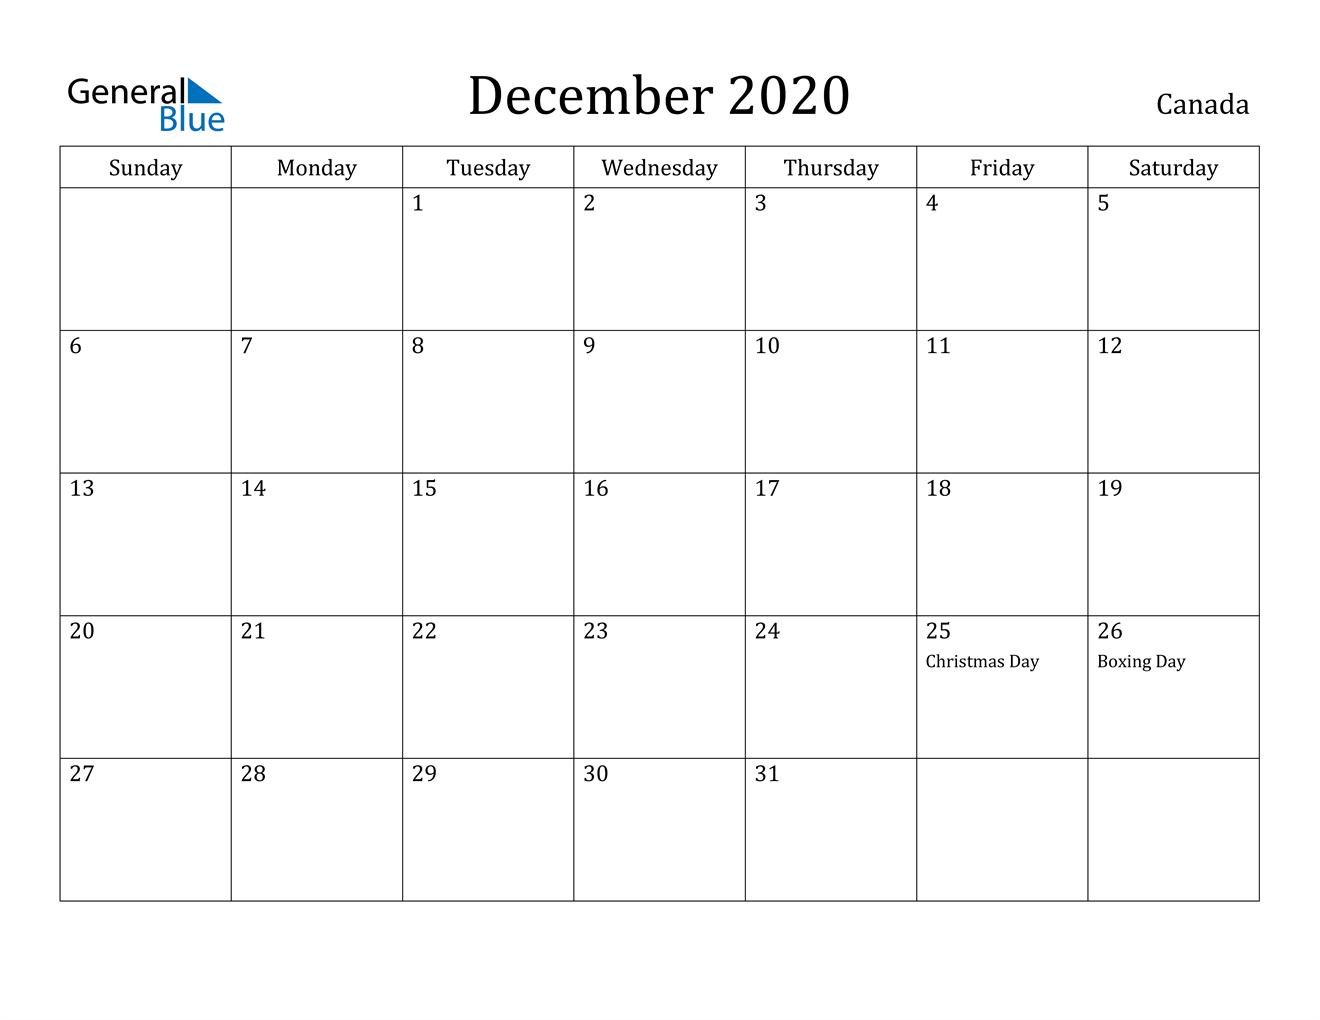 December 2020 Calendar - Canada